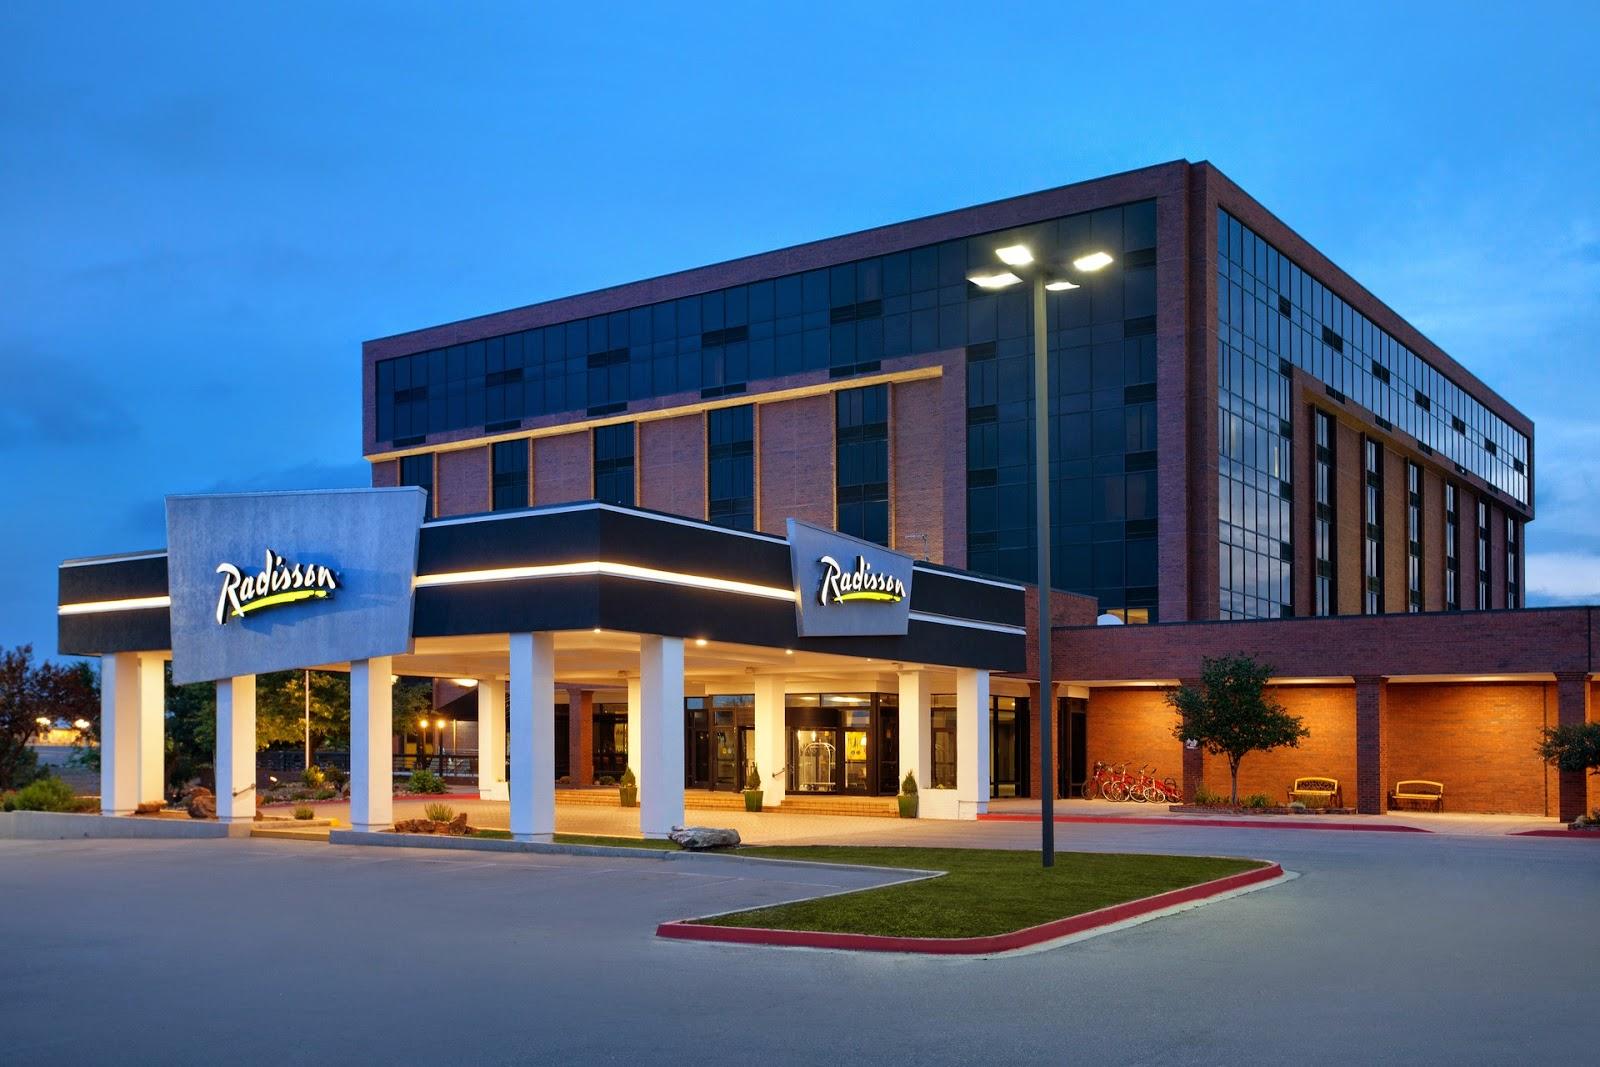 Radisson Hotel Denver - Aurora: Bed and Breakfast Package ...